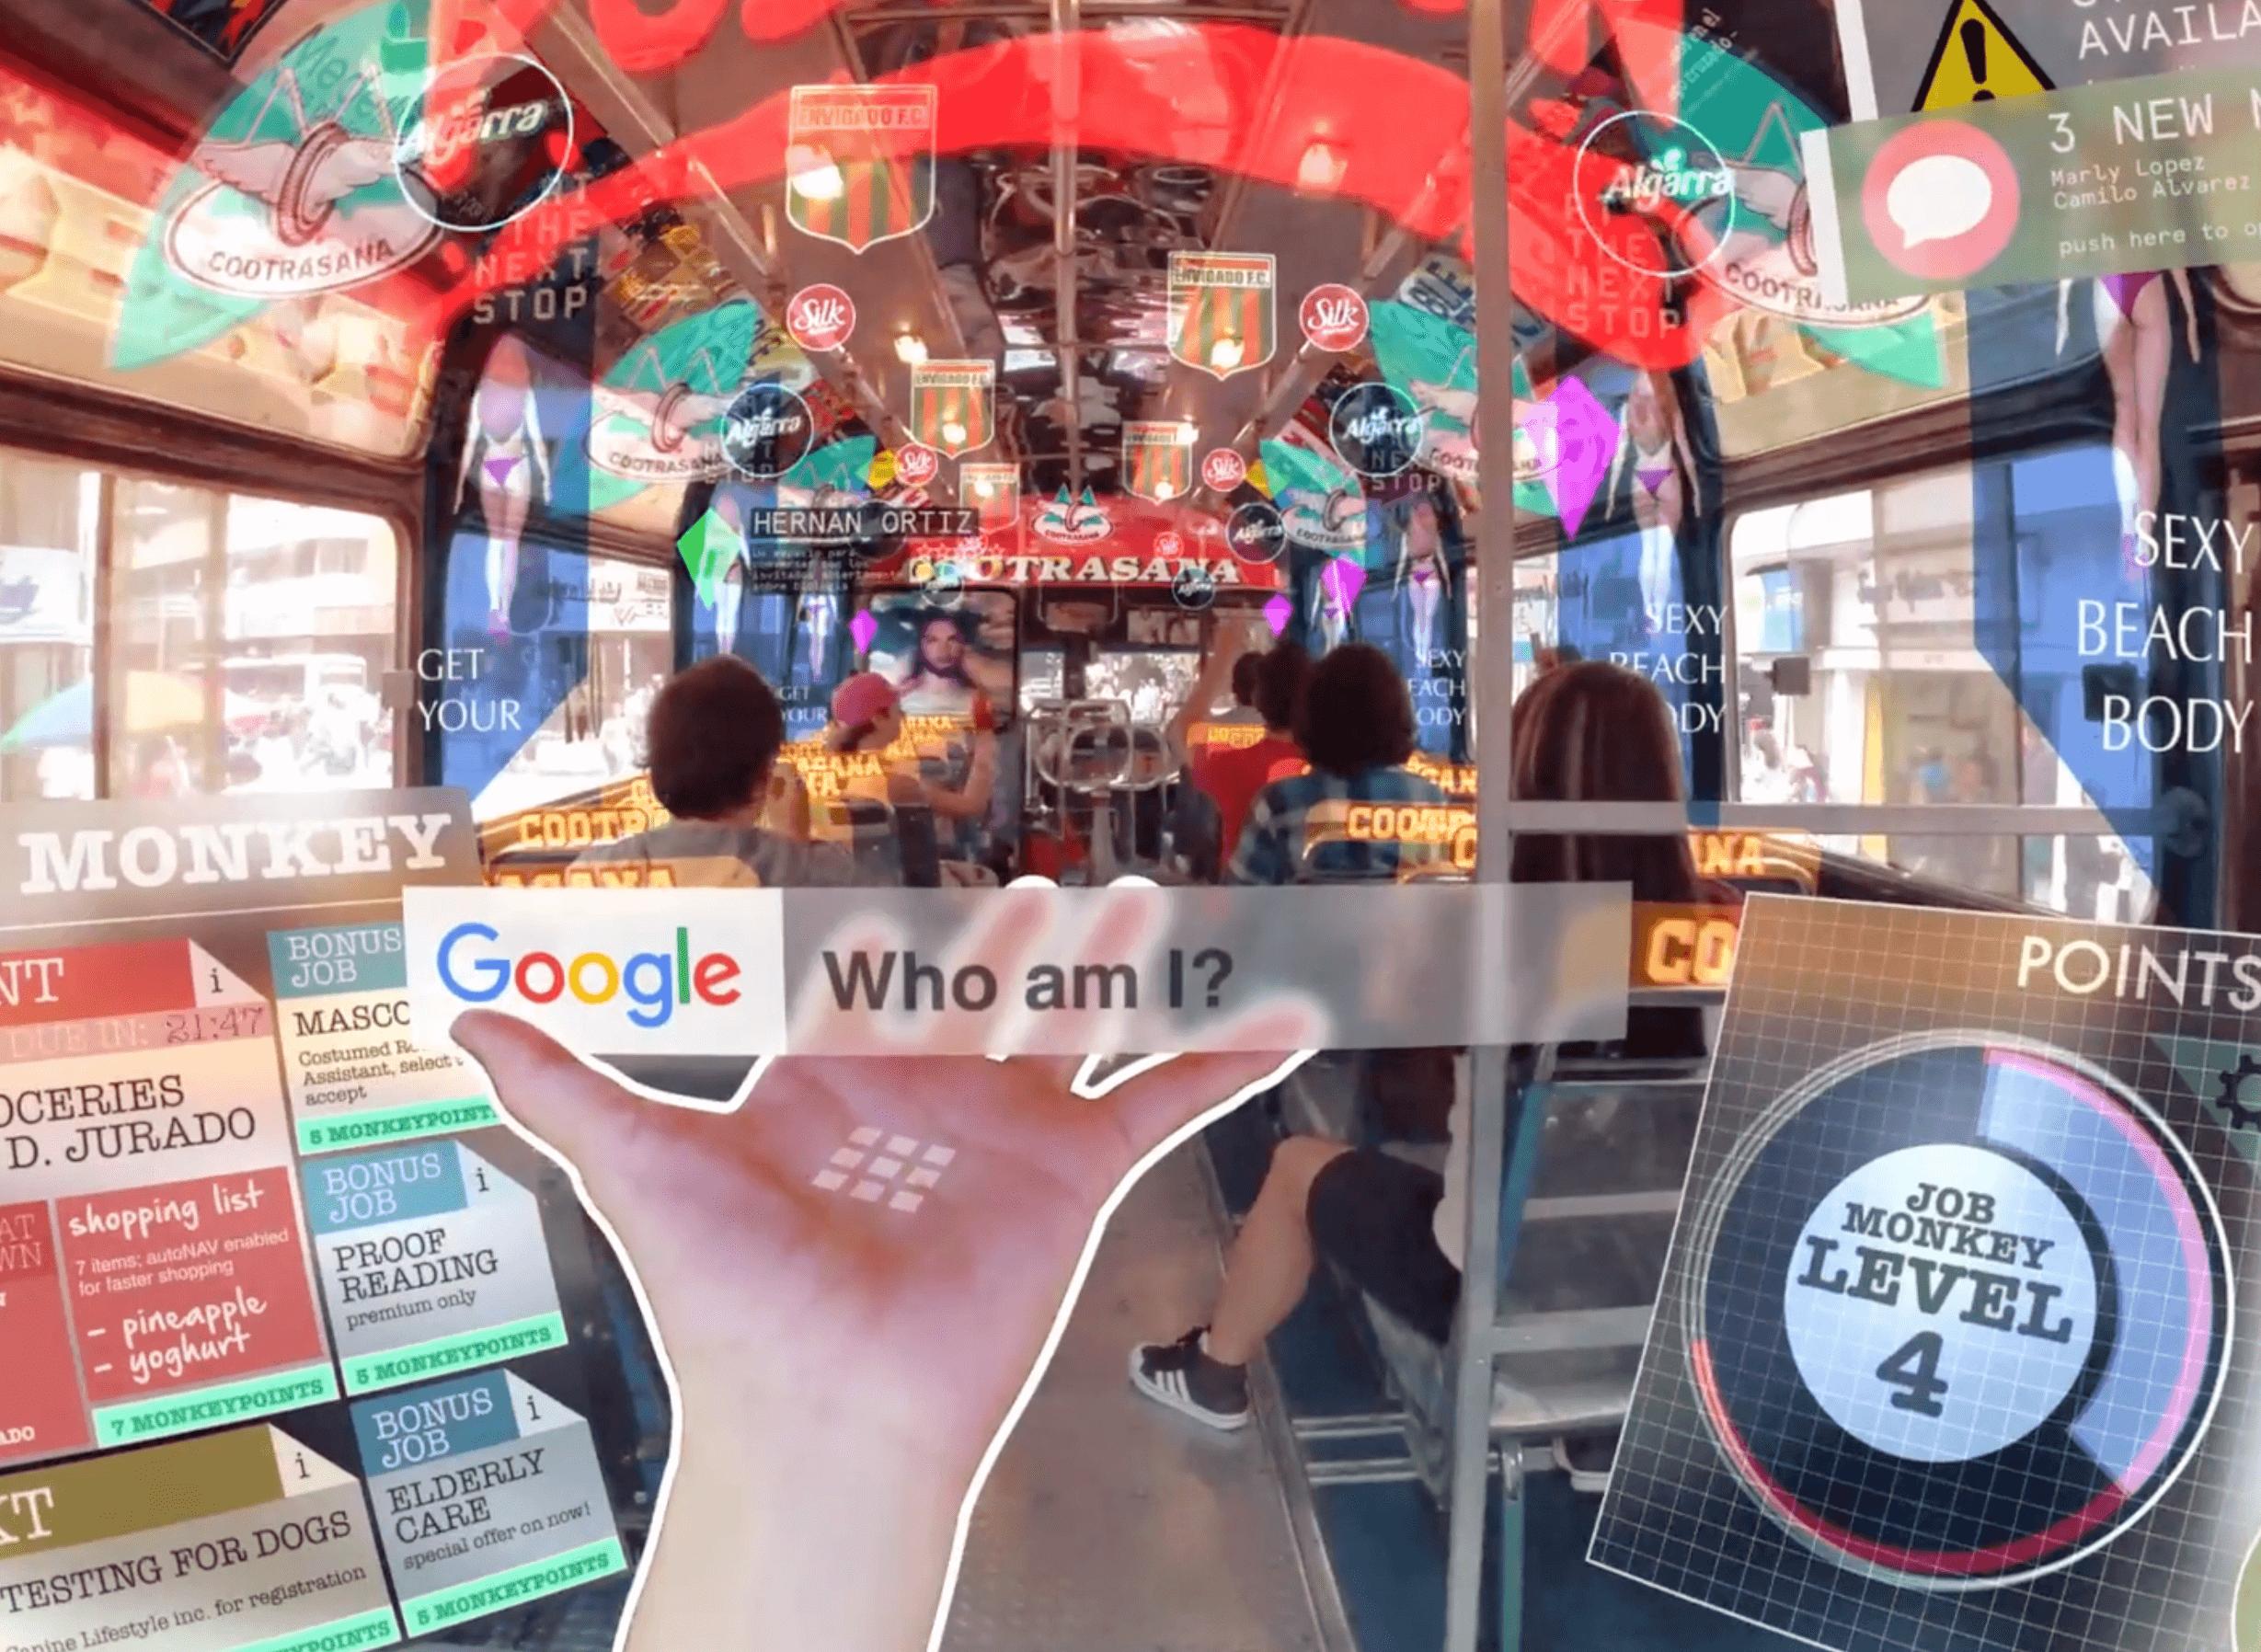 Hyper-Reality by Keiichi Matsuda